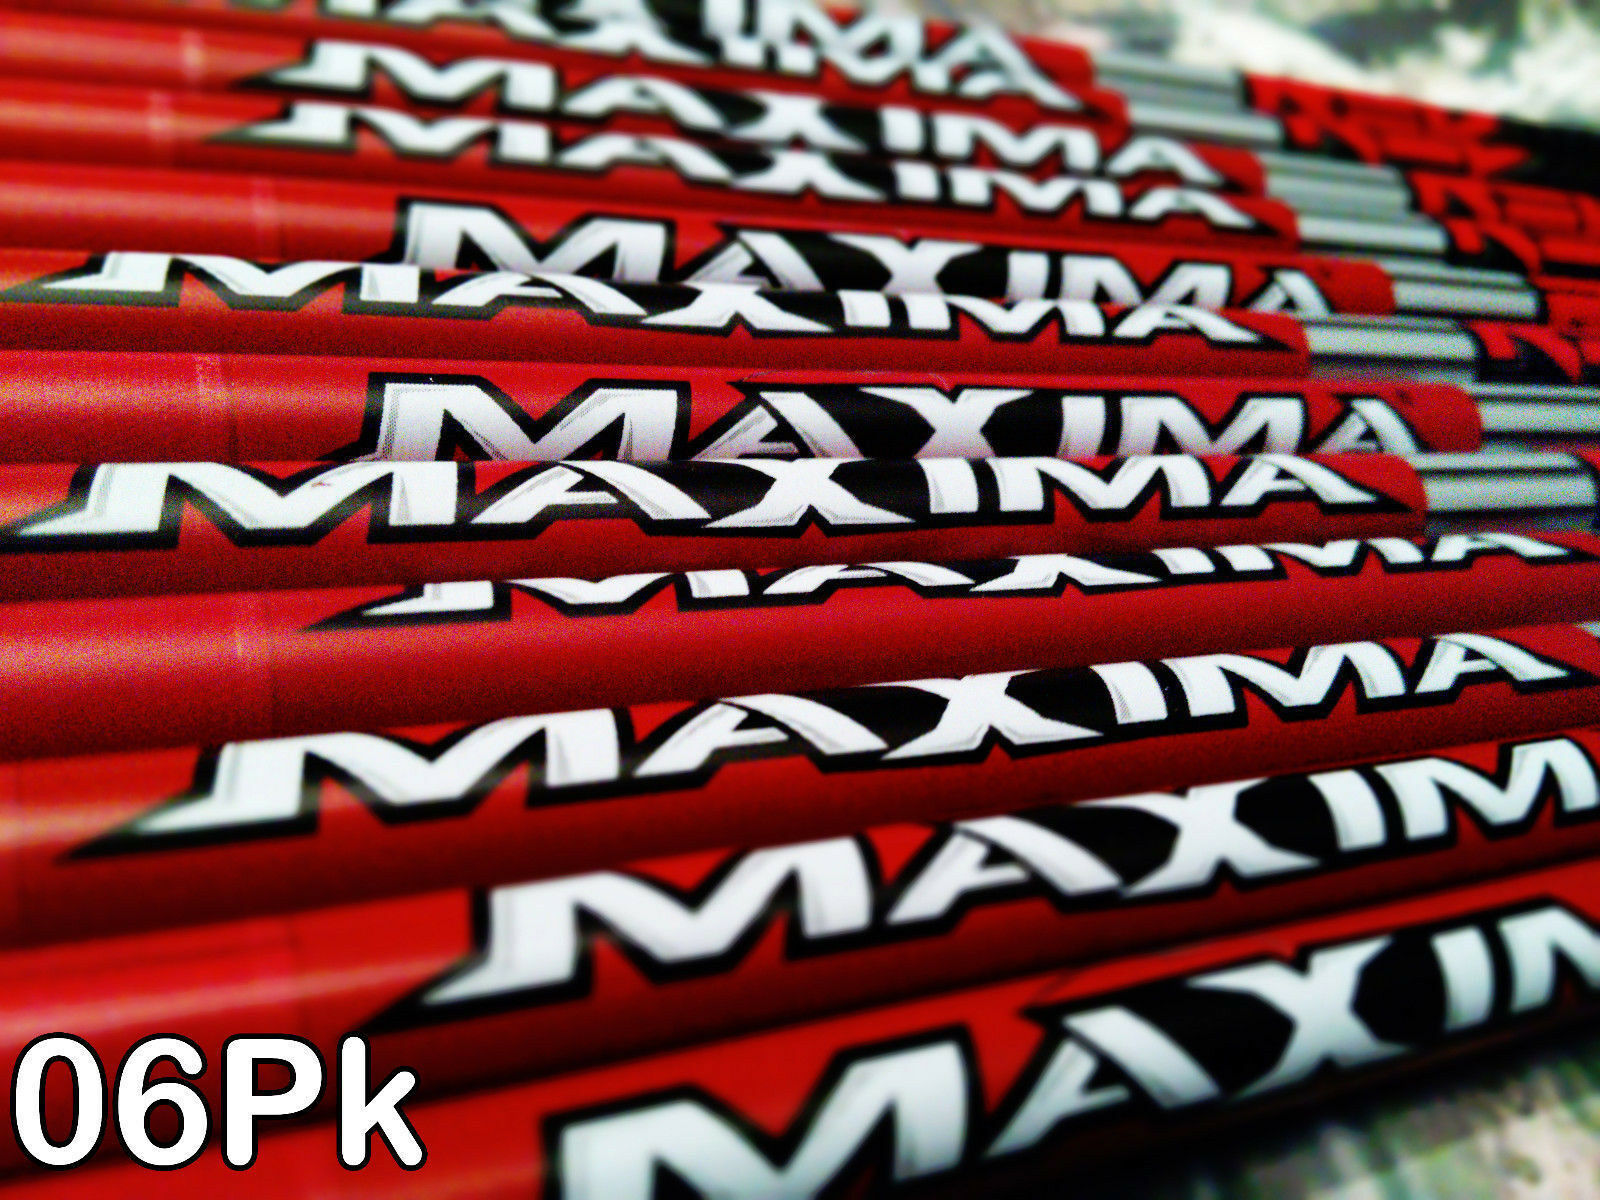 MAXIMA RED MATHEWS SHAFTS  CUT FREE CARBON EXPRESS 1 2 DZ